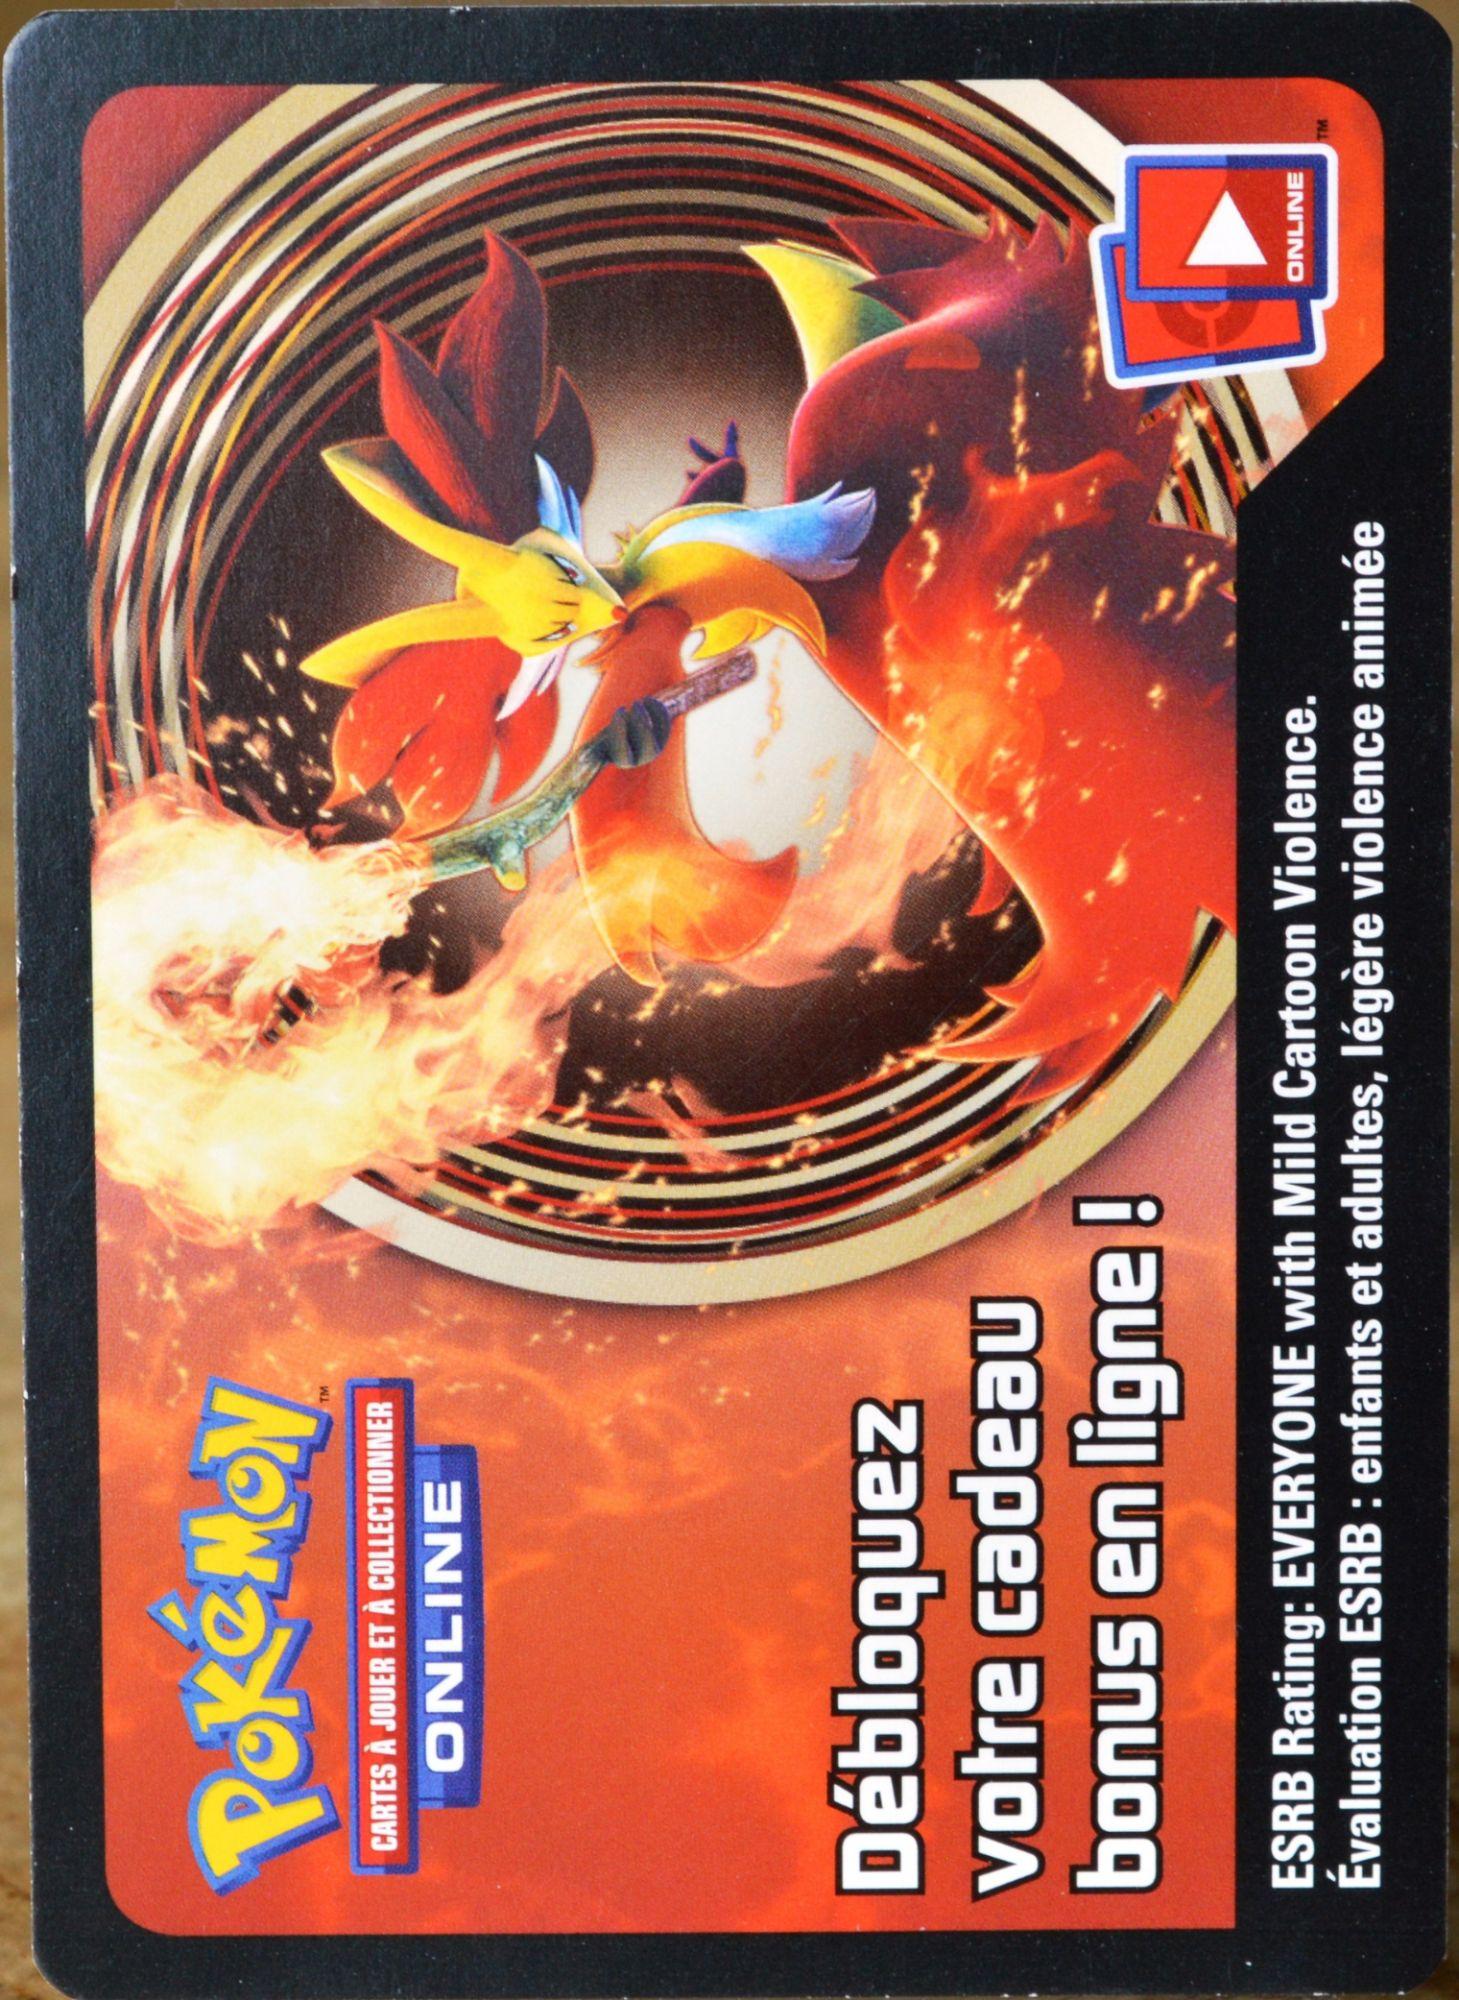 Jcc Pokemon Carte A Code Online Goupelin Codes Neuf Non Utilise Rakuten